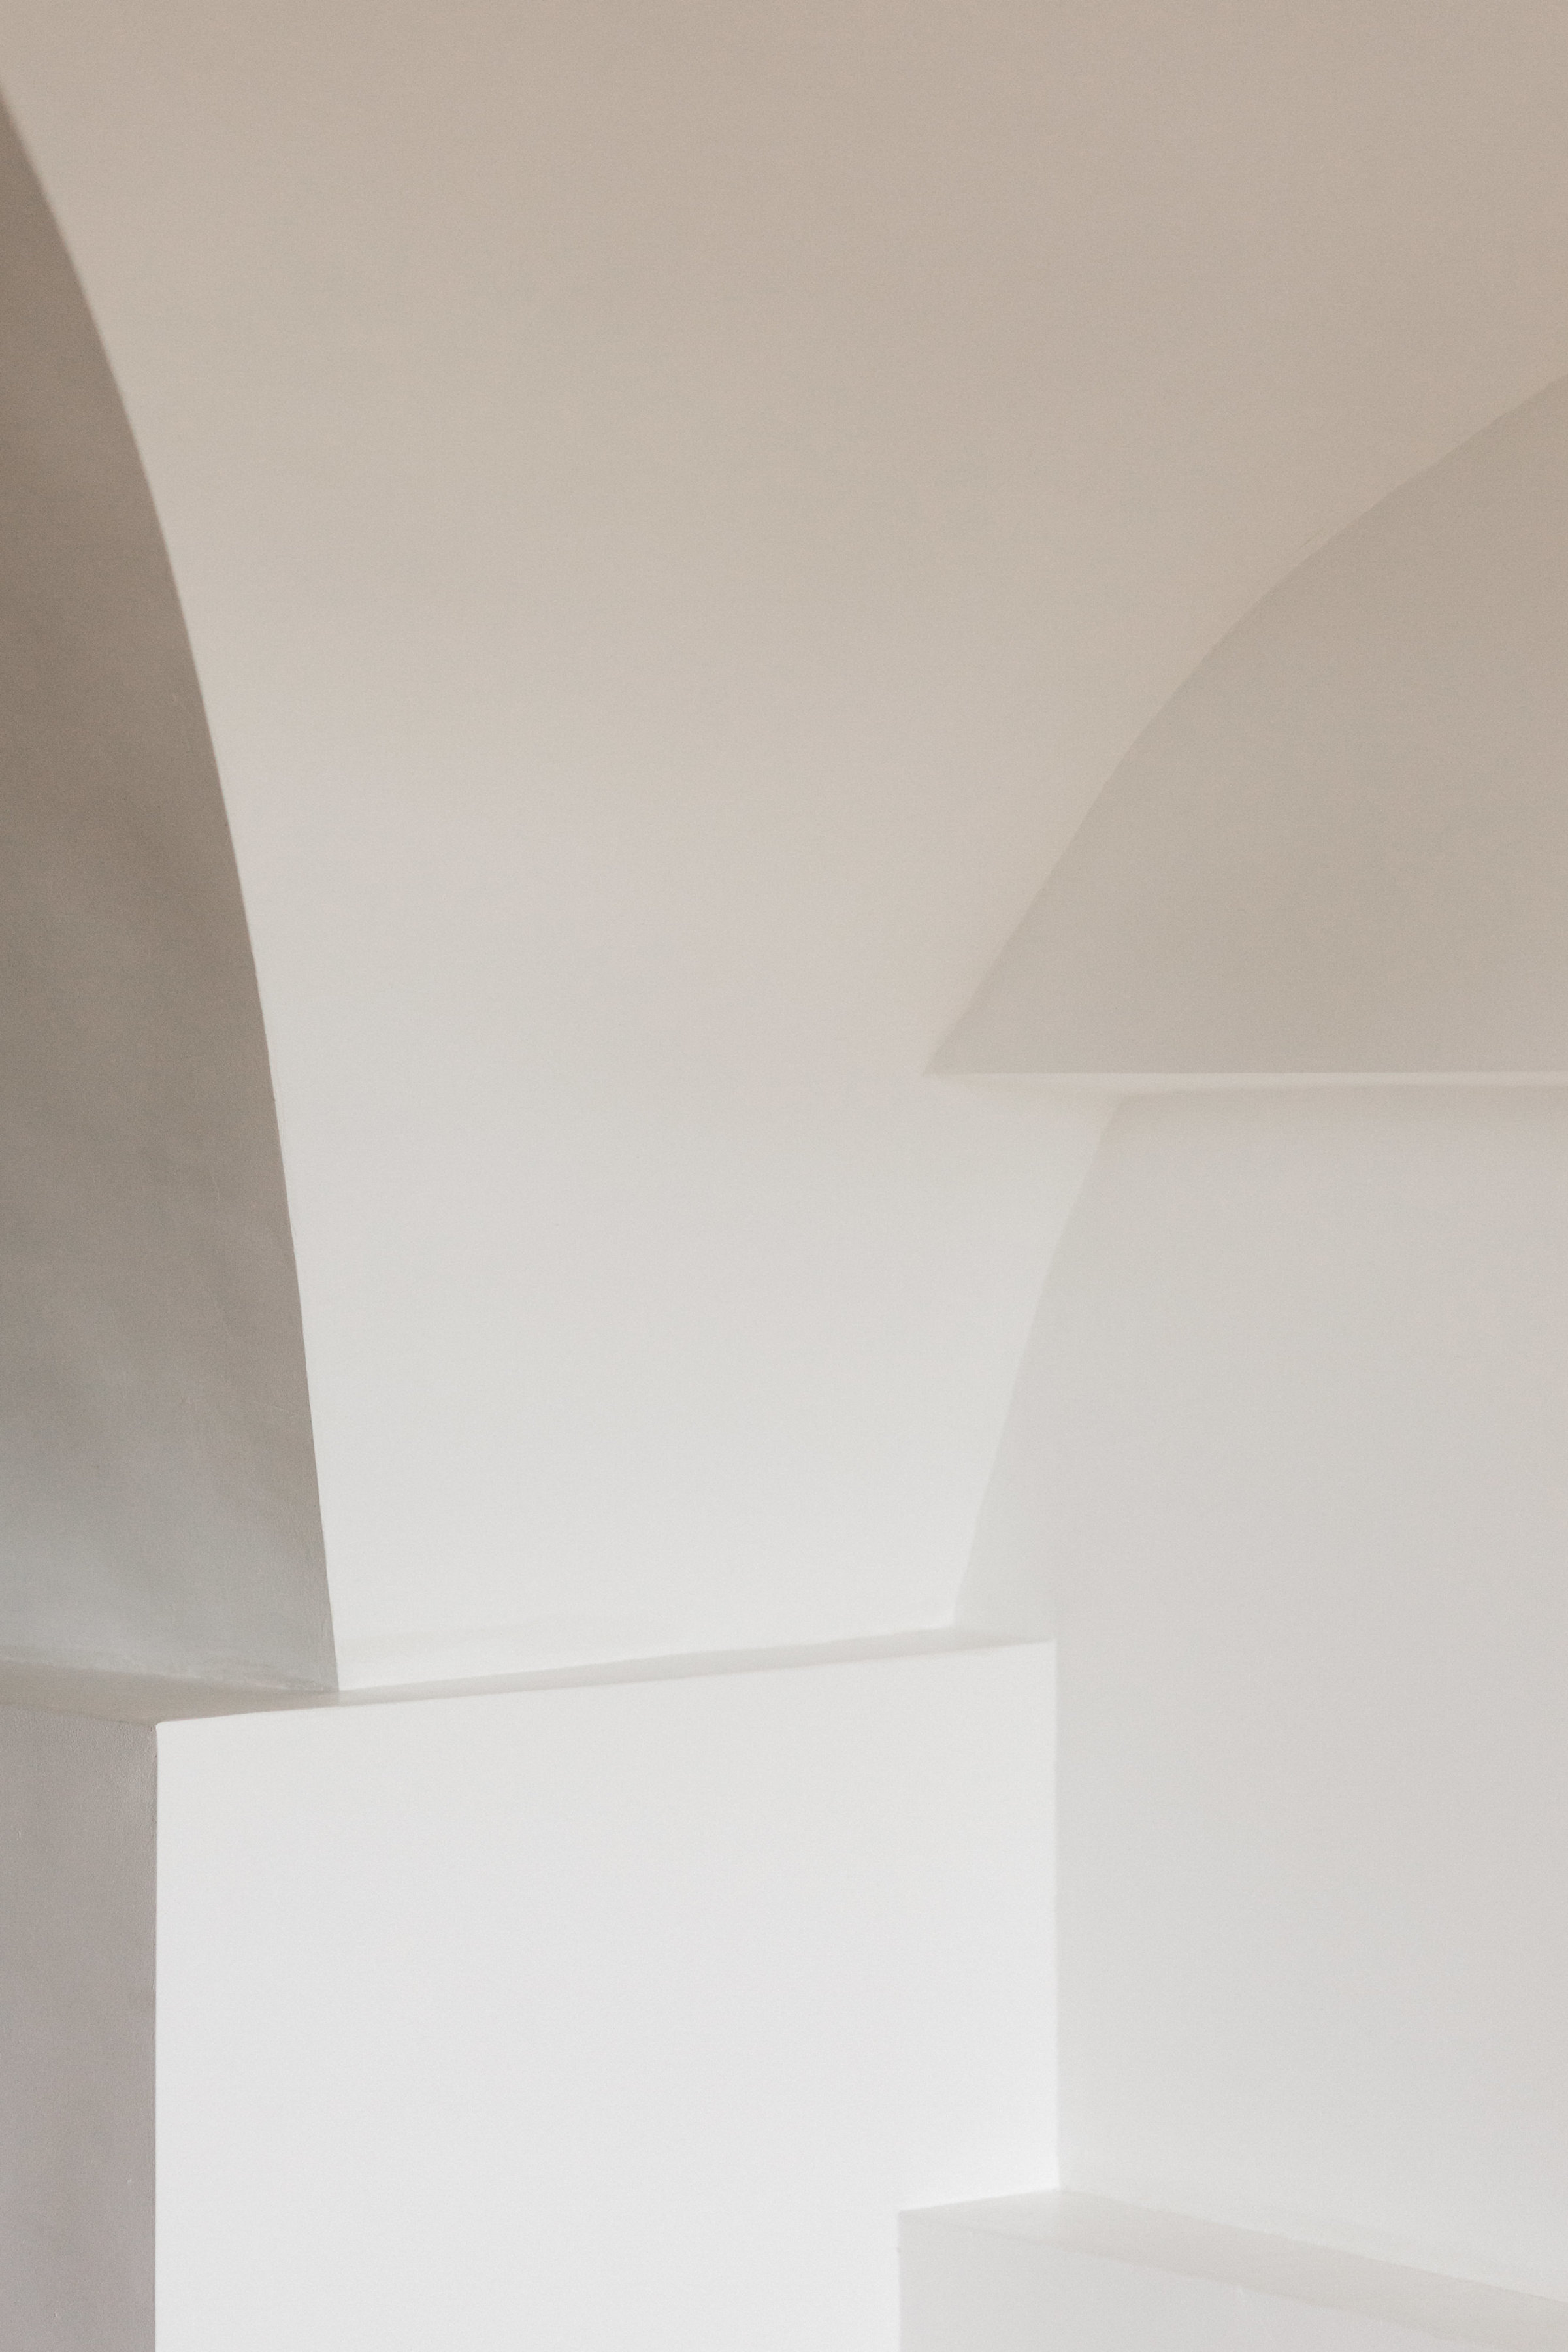 Collective-Fabien-Courmont-Editorial-2